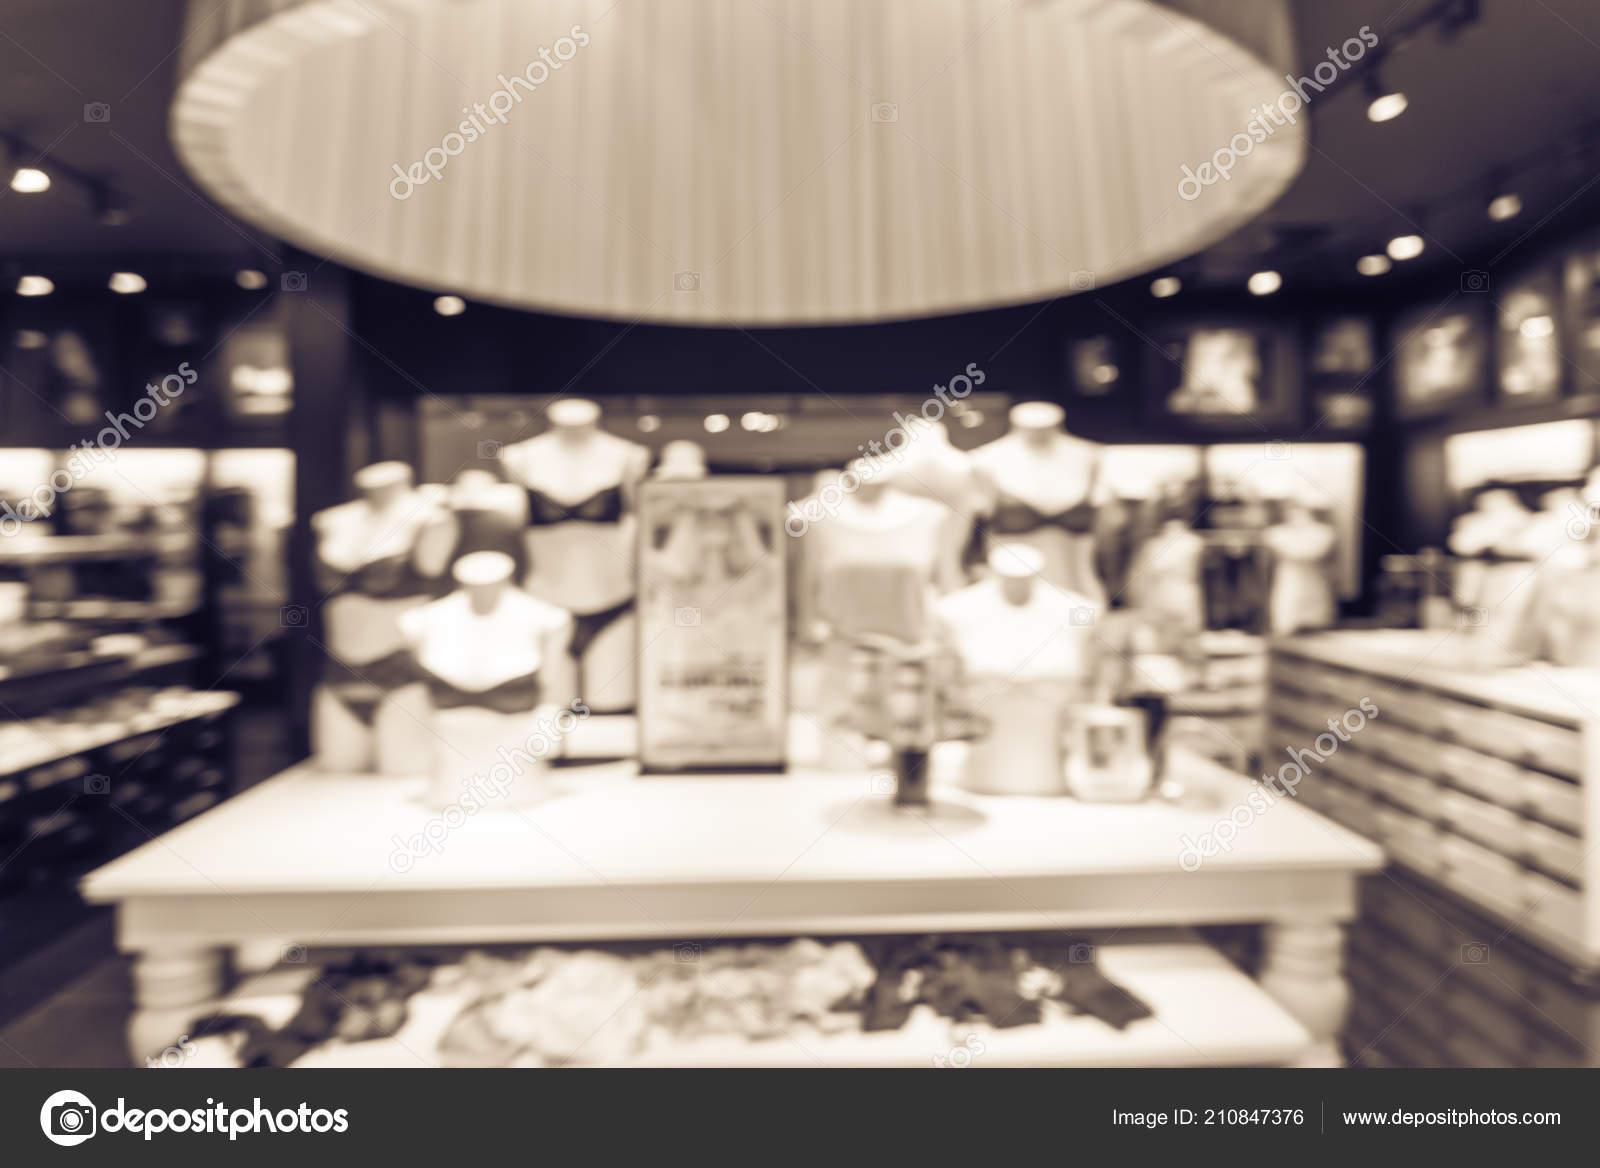 4e989aeb2288 Interior Imagen Borrosa Colores Mujer Moderna Tienda Lencería Ropa ...